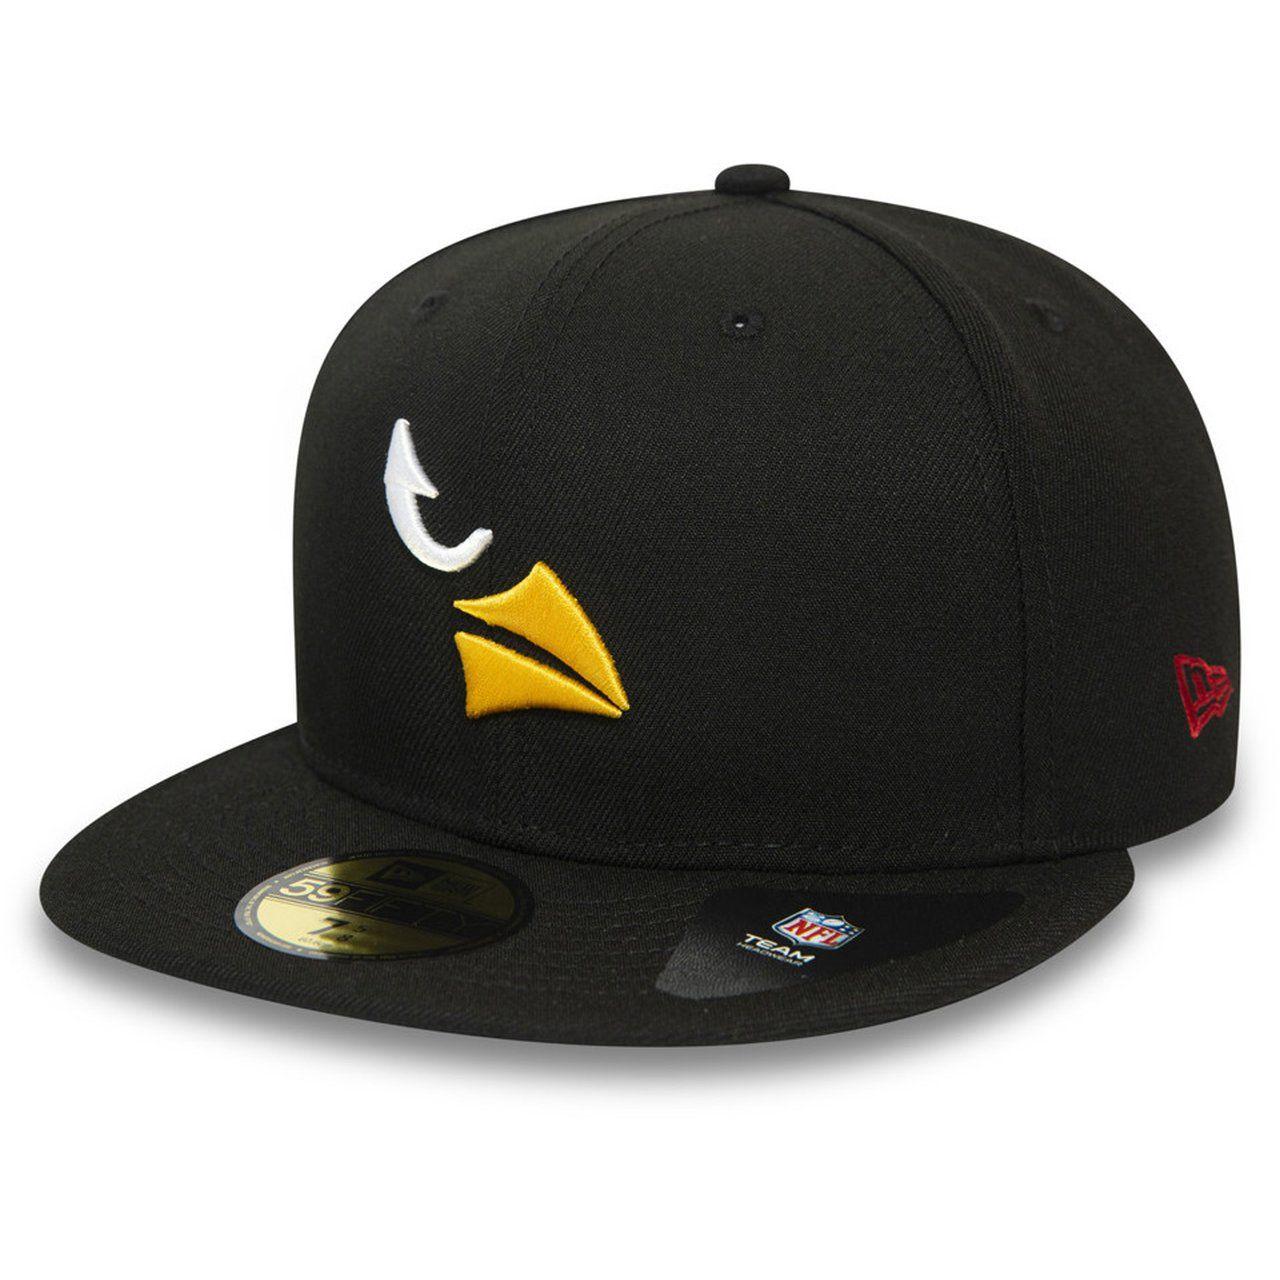 amfoo - New Era 59Fifty Fitted Cap - ELEMENTS Arizona Cardinals